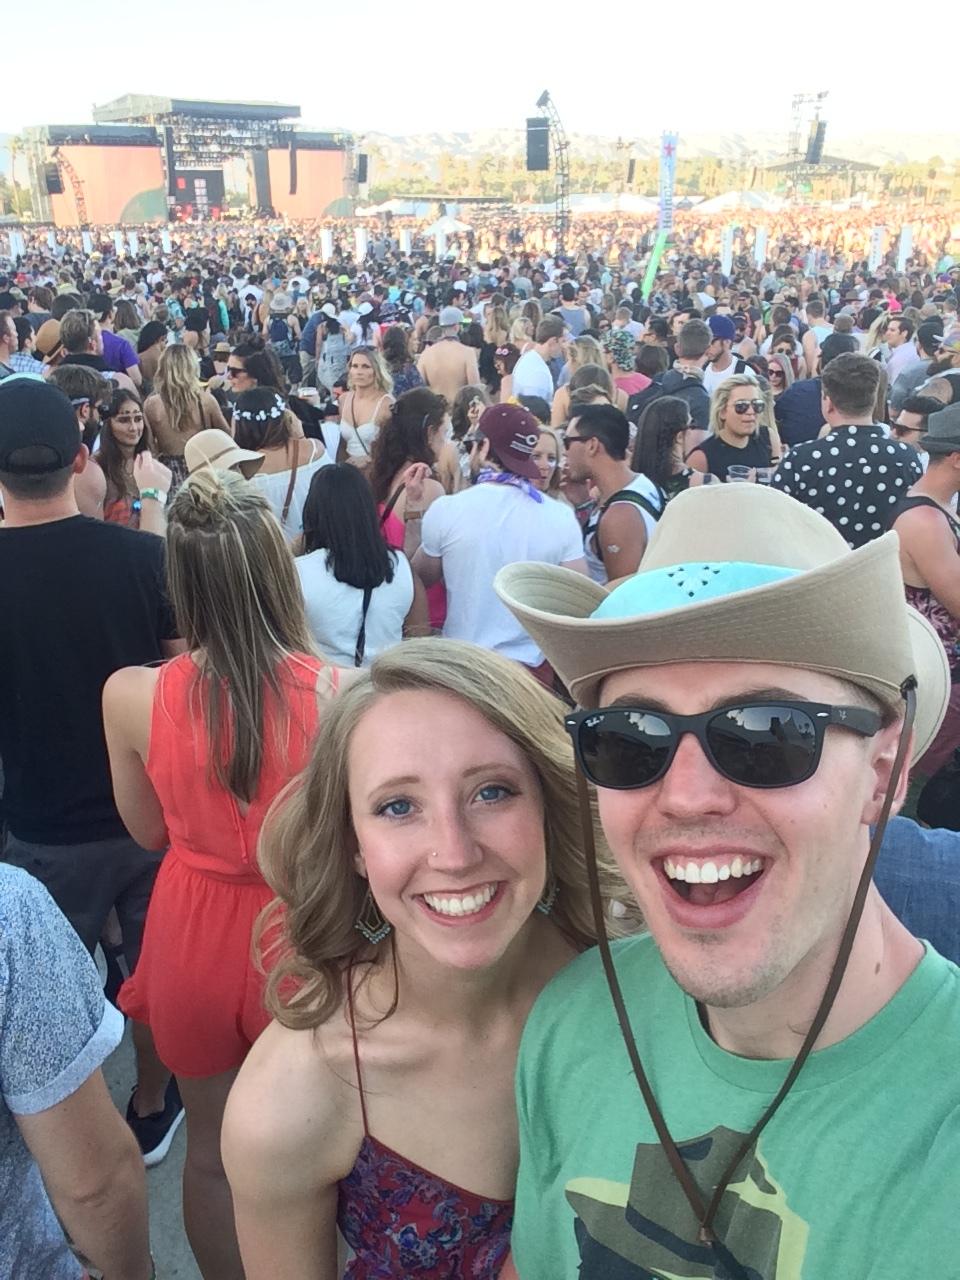 Happy Coachella